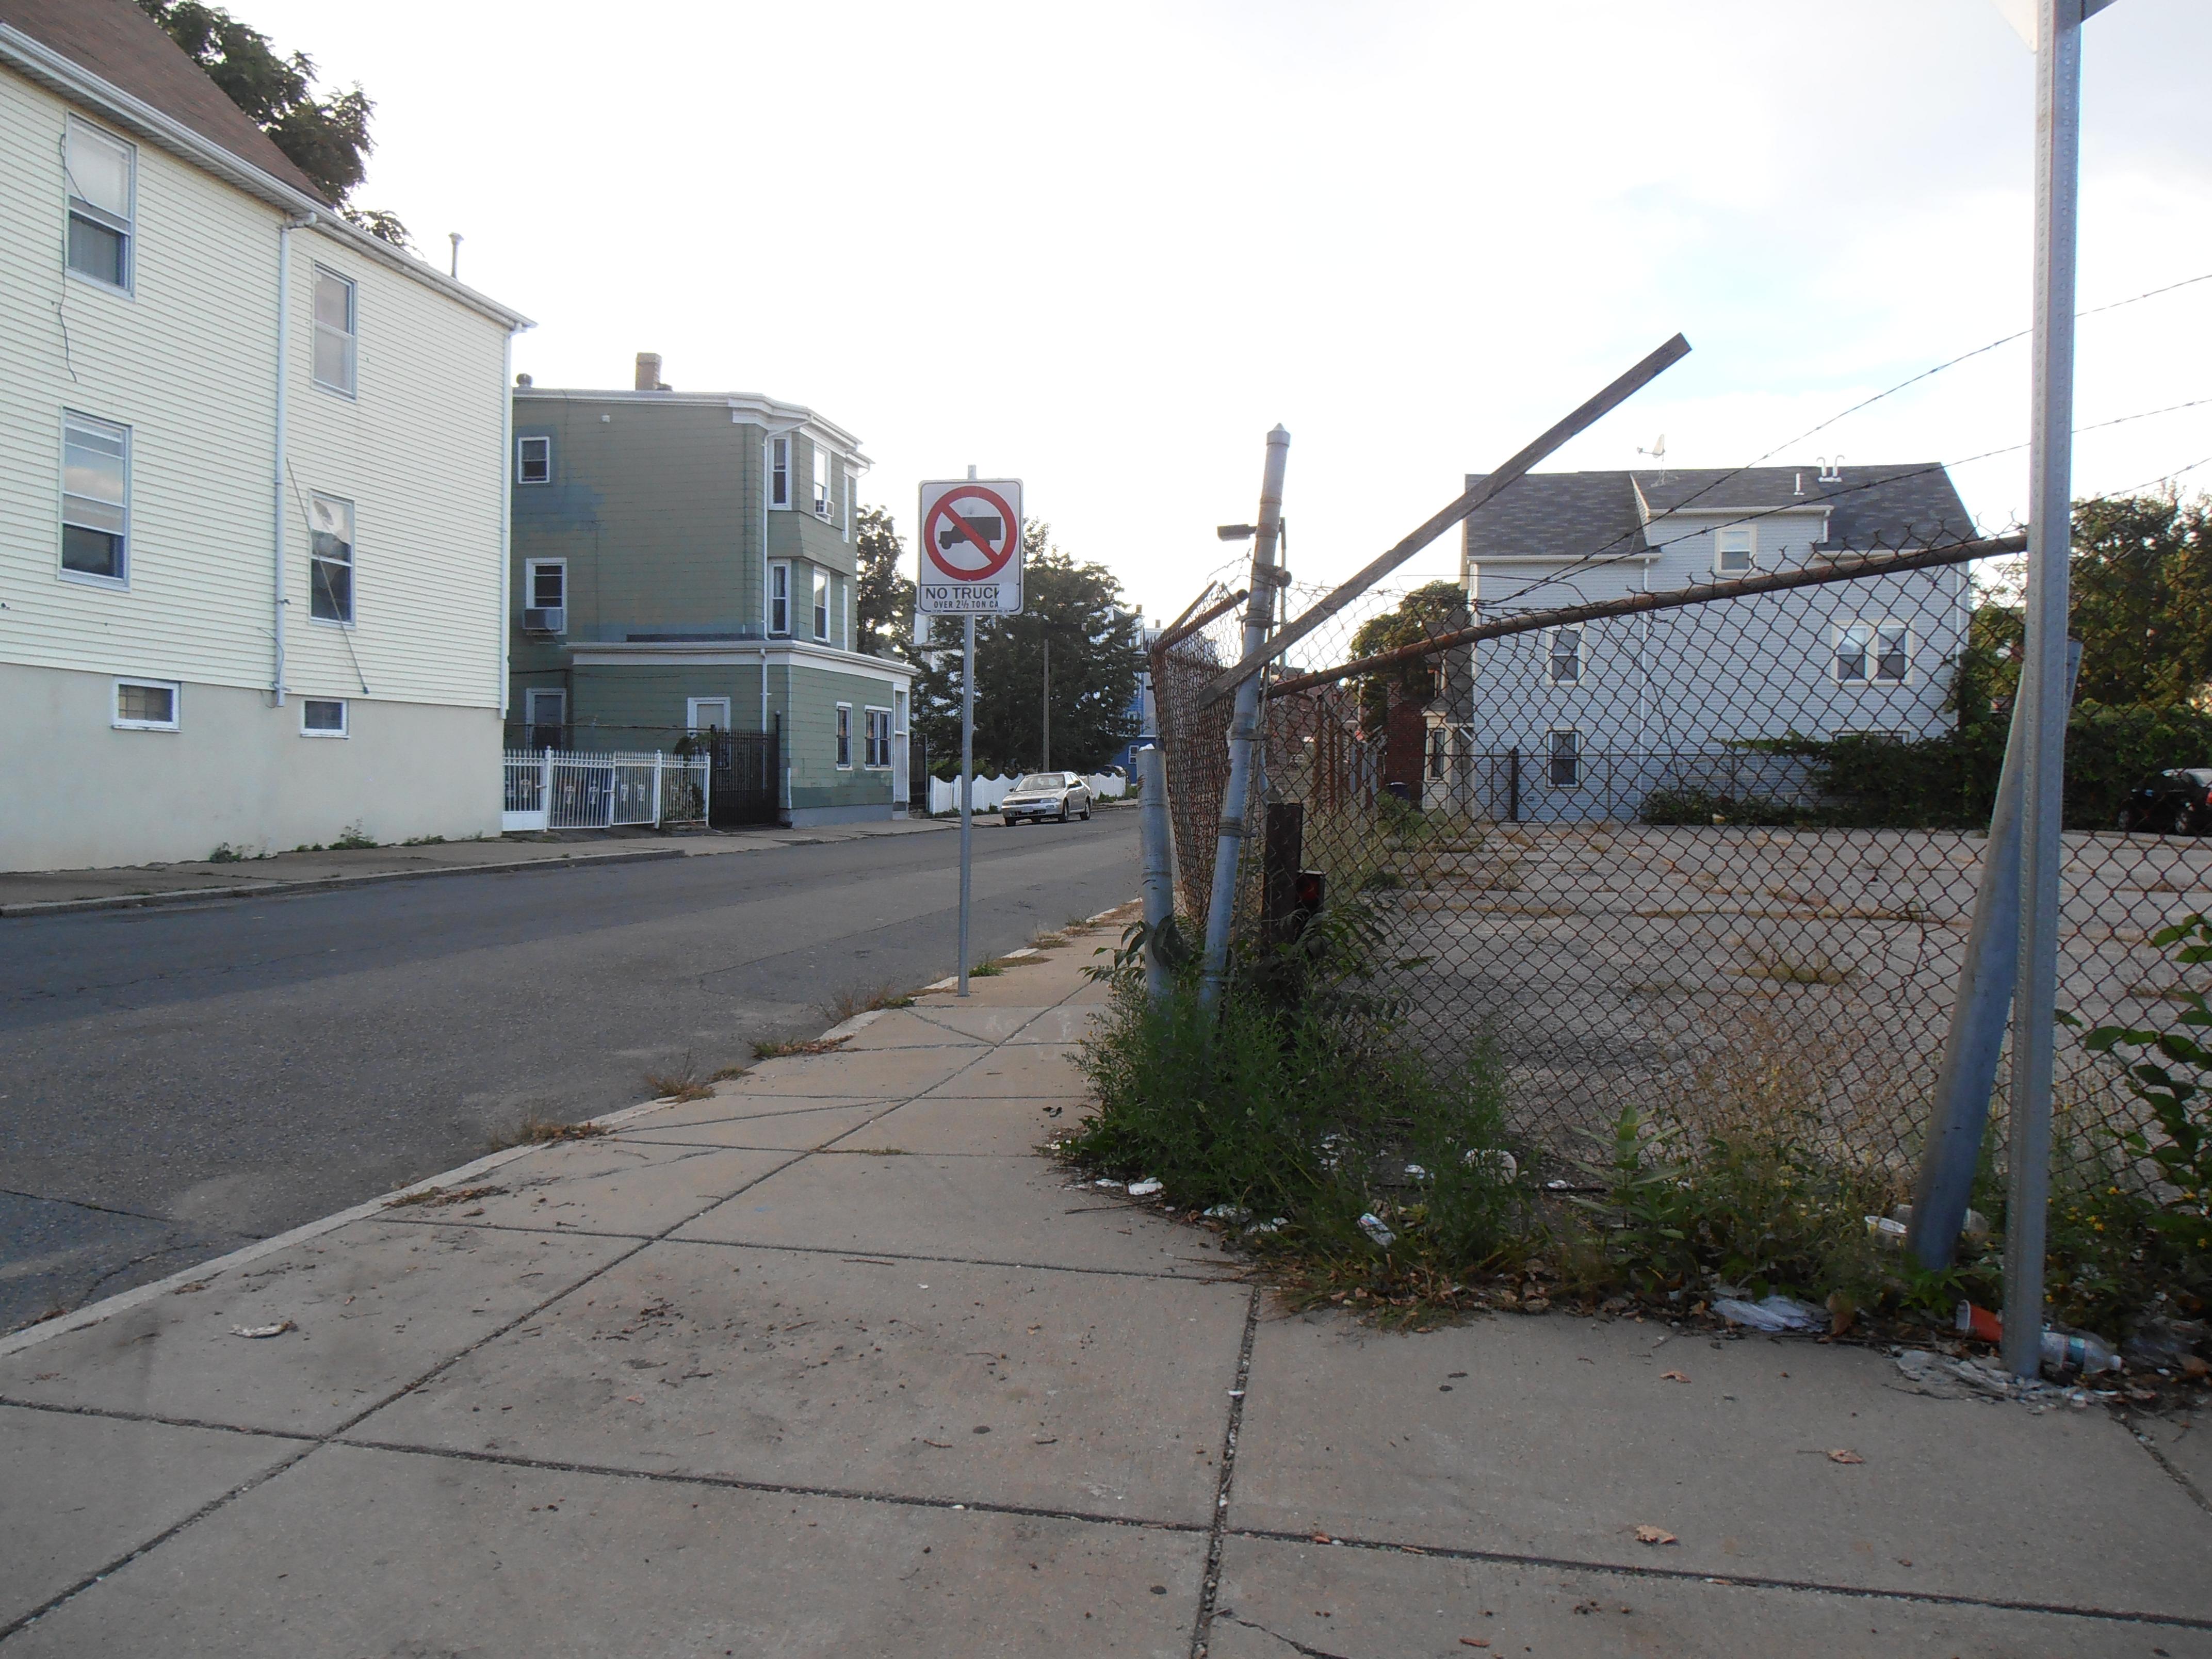 Poverty in america essay conclusion